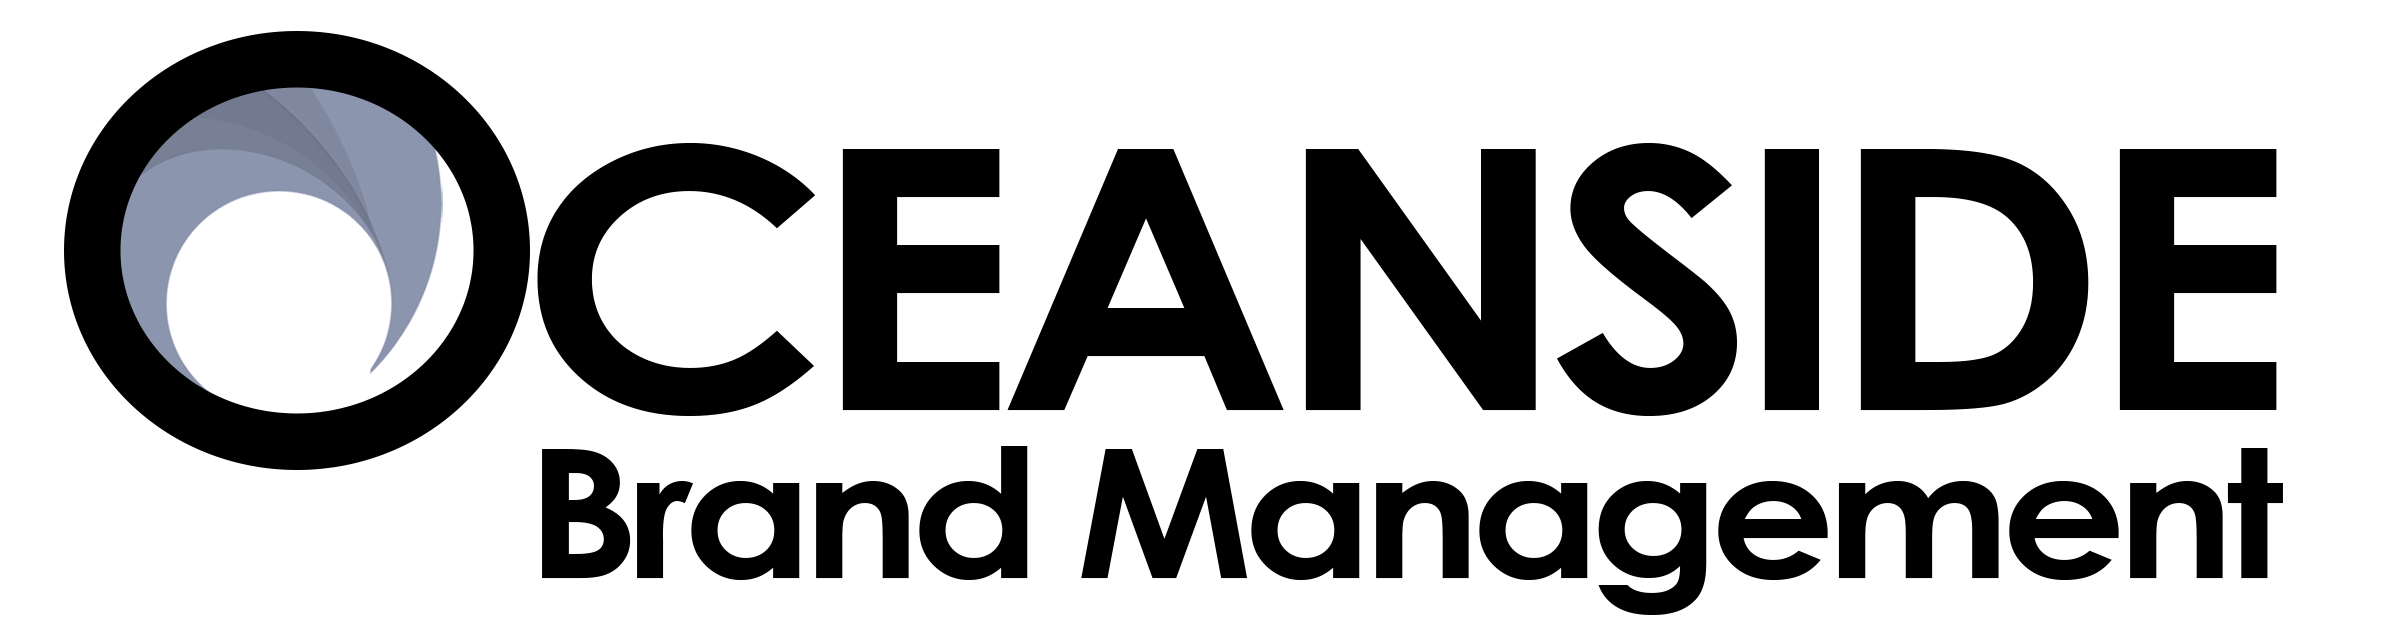 Oceanside Brand Management